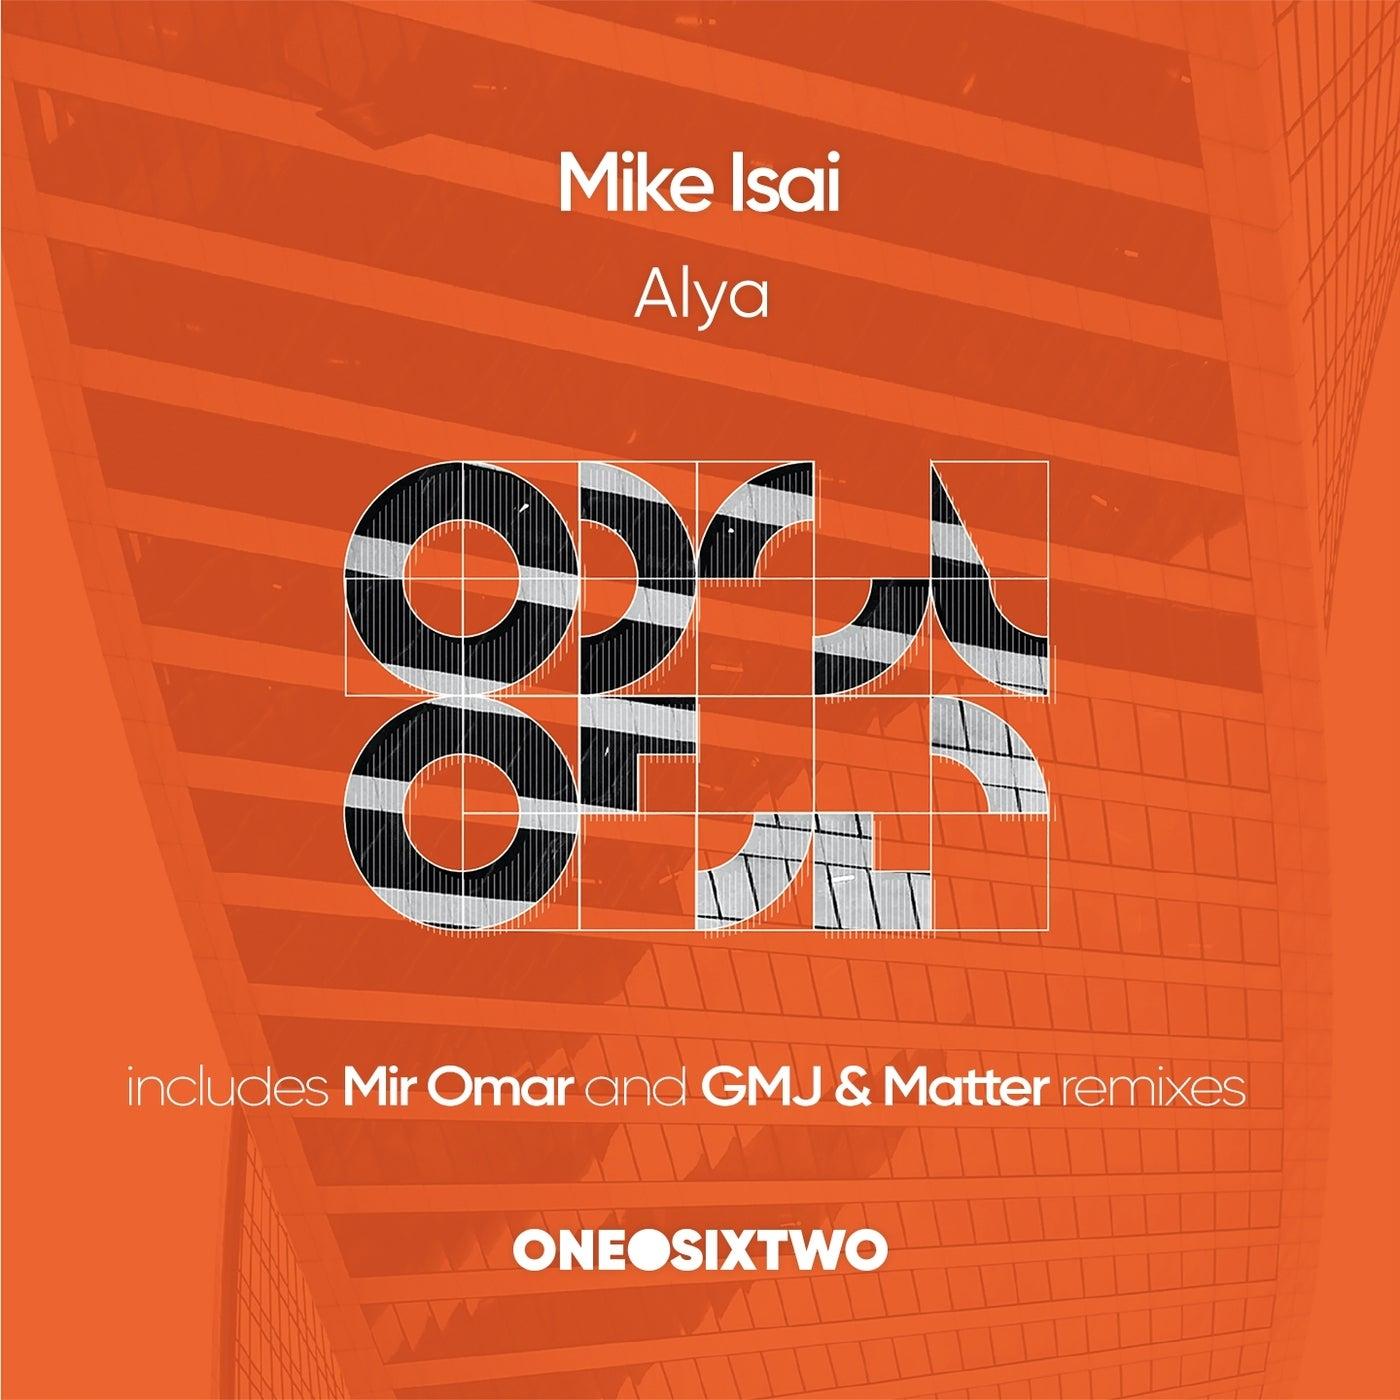 Chrysalis (Gmj & Matter Remix)